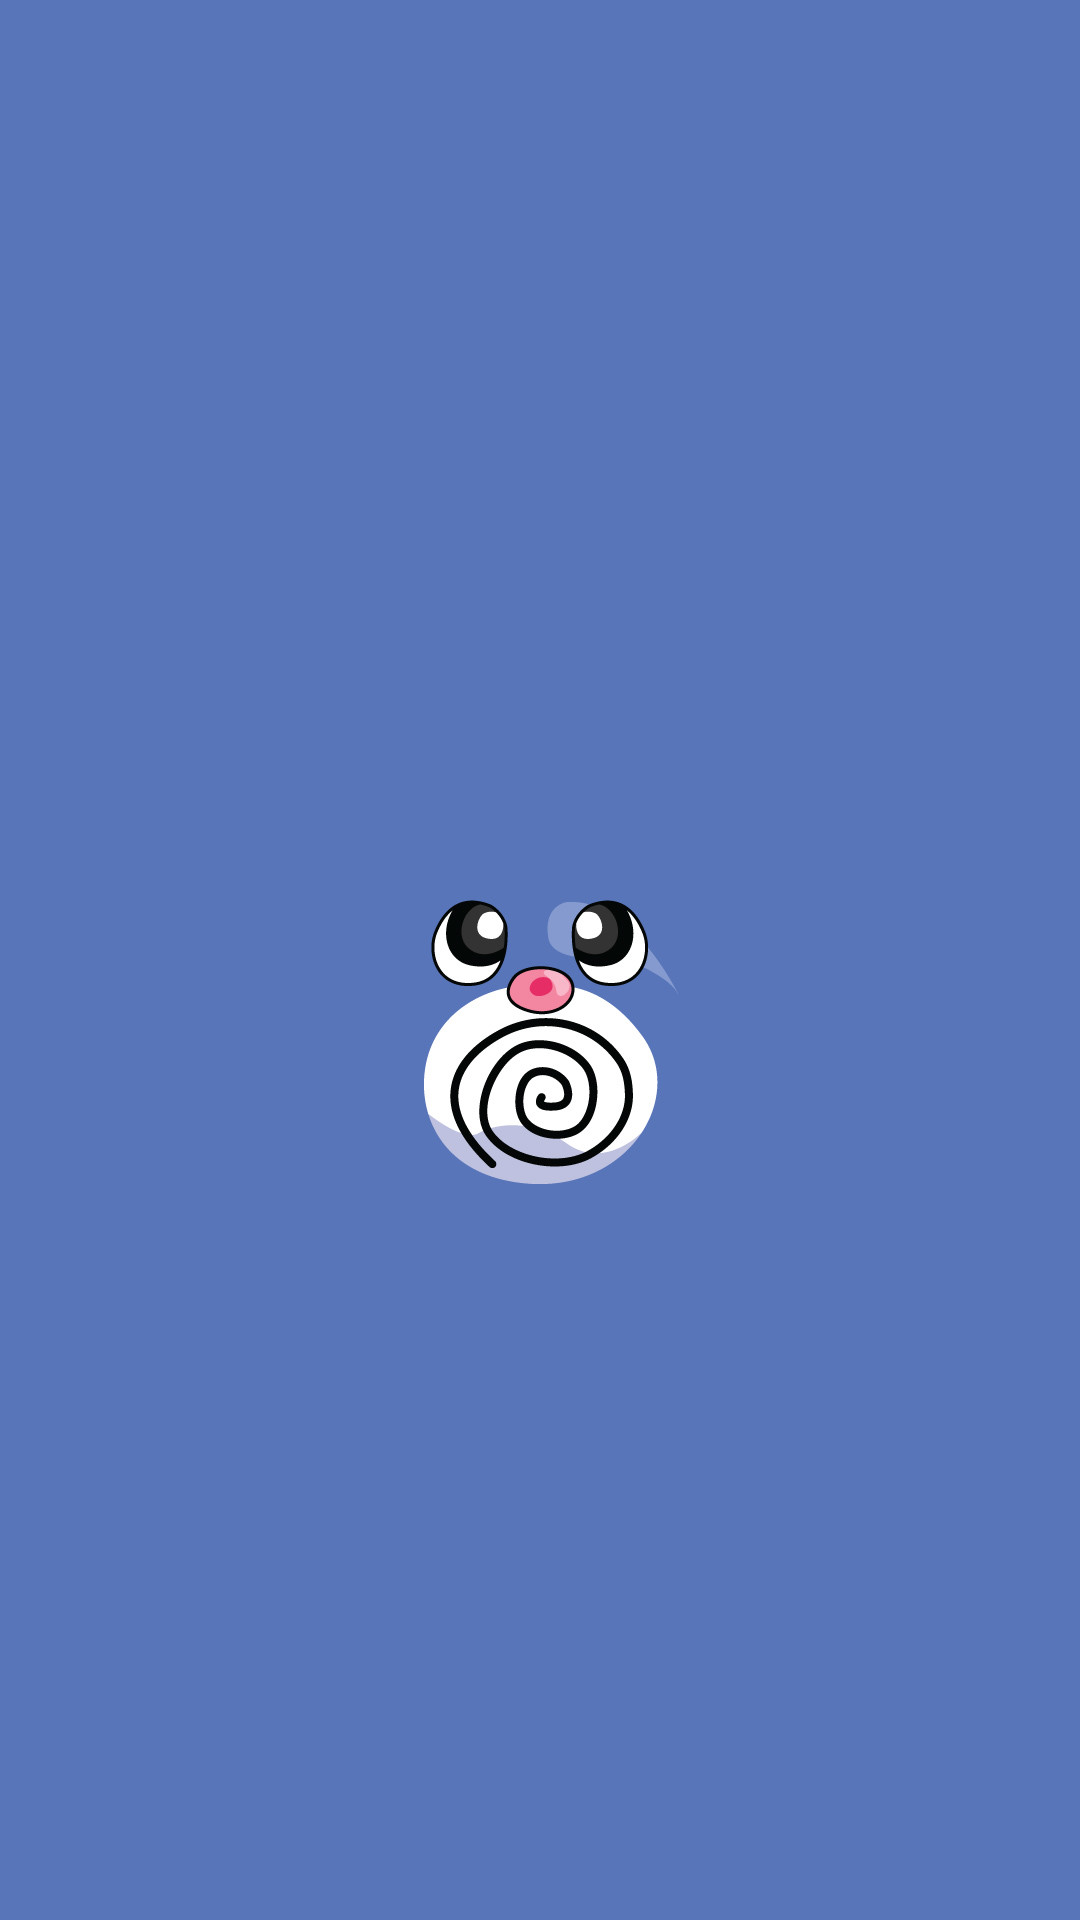 Poliwag Pokemon iPhone 6+ HD Wallpaper – https://freebestpicture.com/